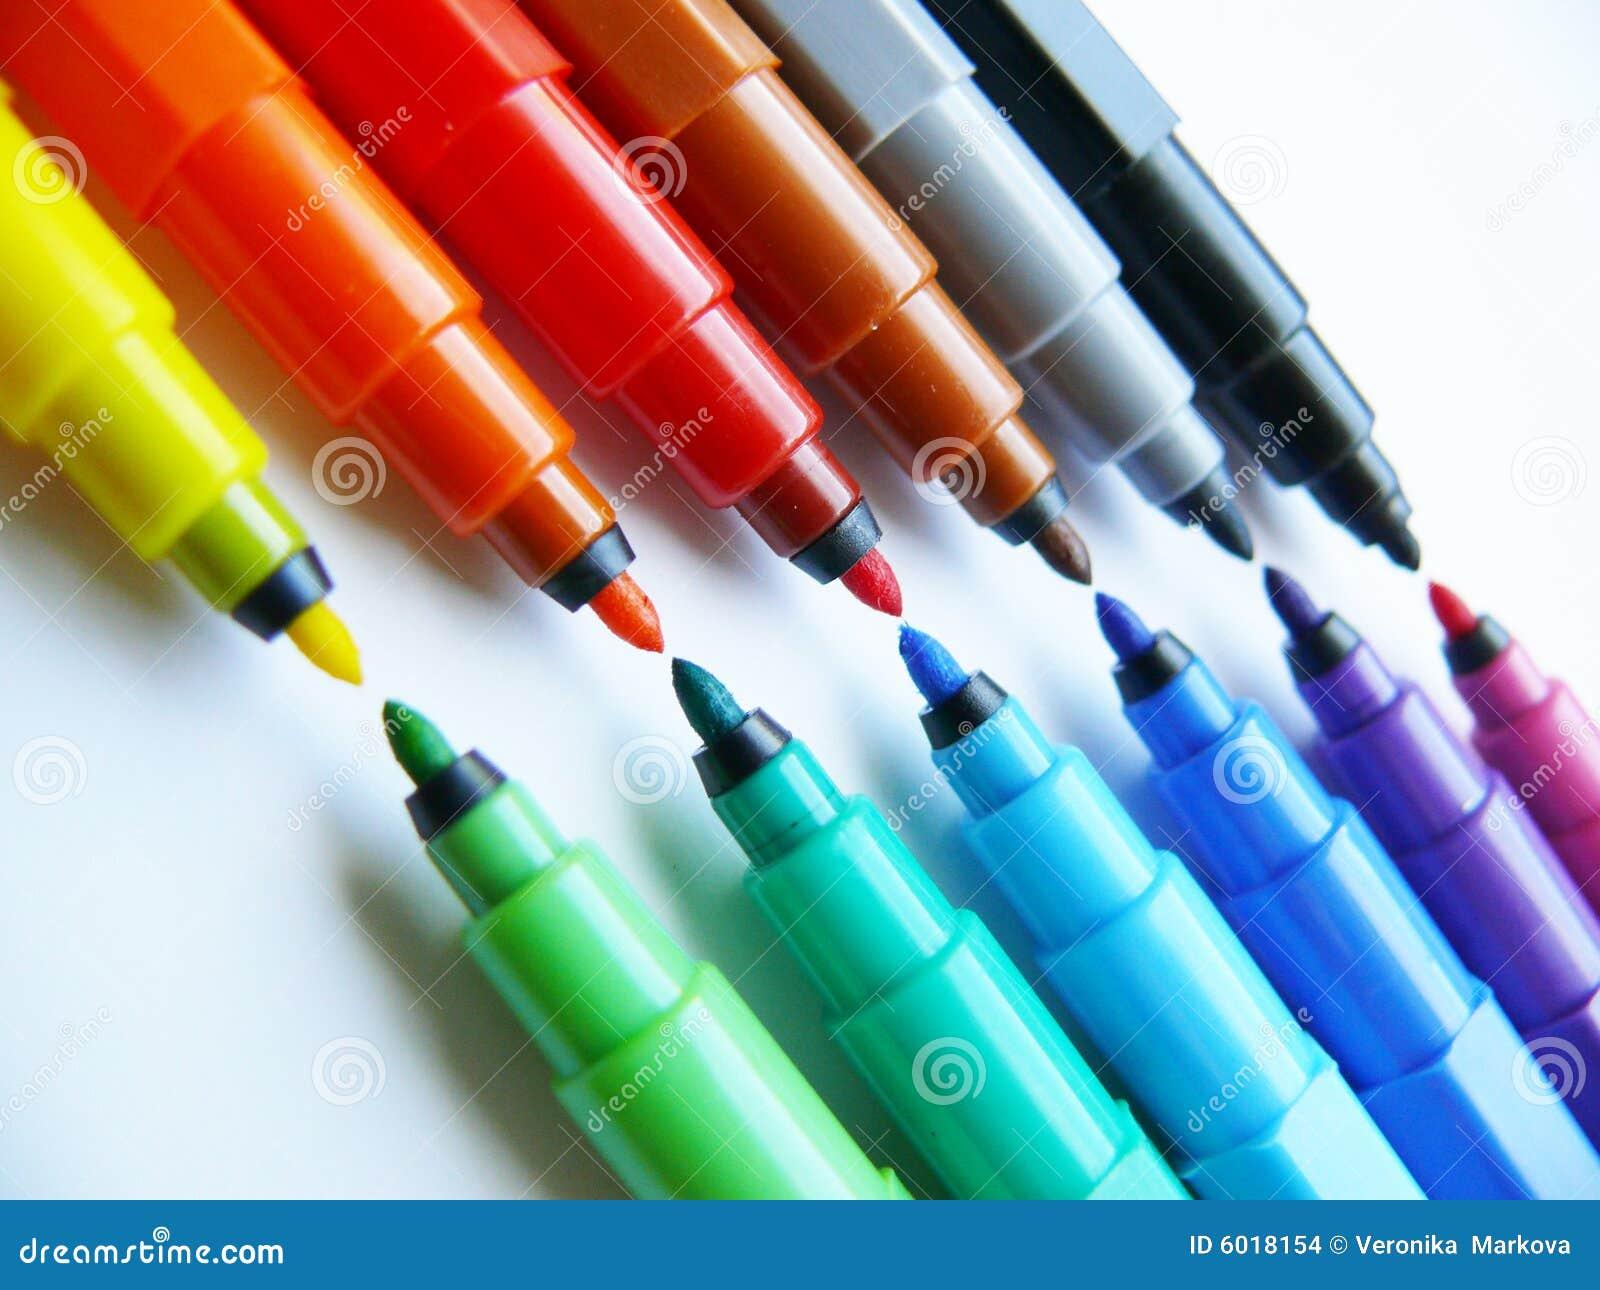 open felt tip pens markers stock photo image of color pens 6018154. Black Bedroom Furniture Sets. Home Design Ideas